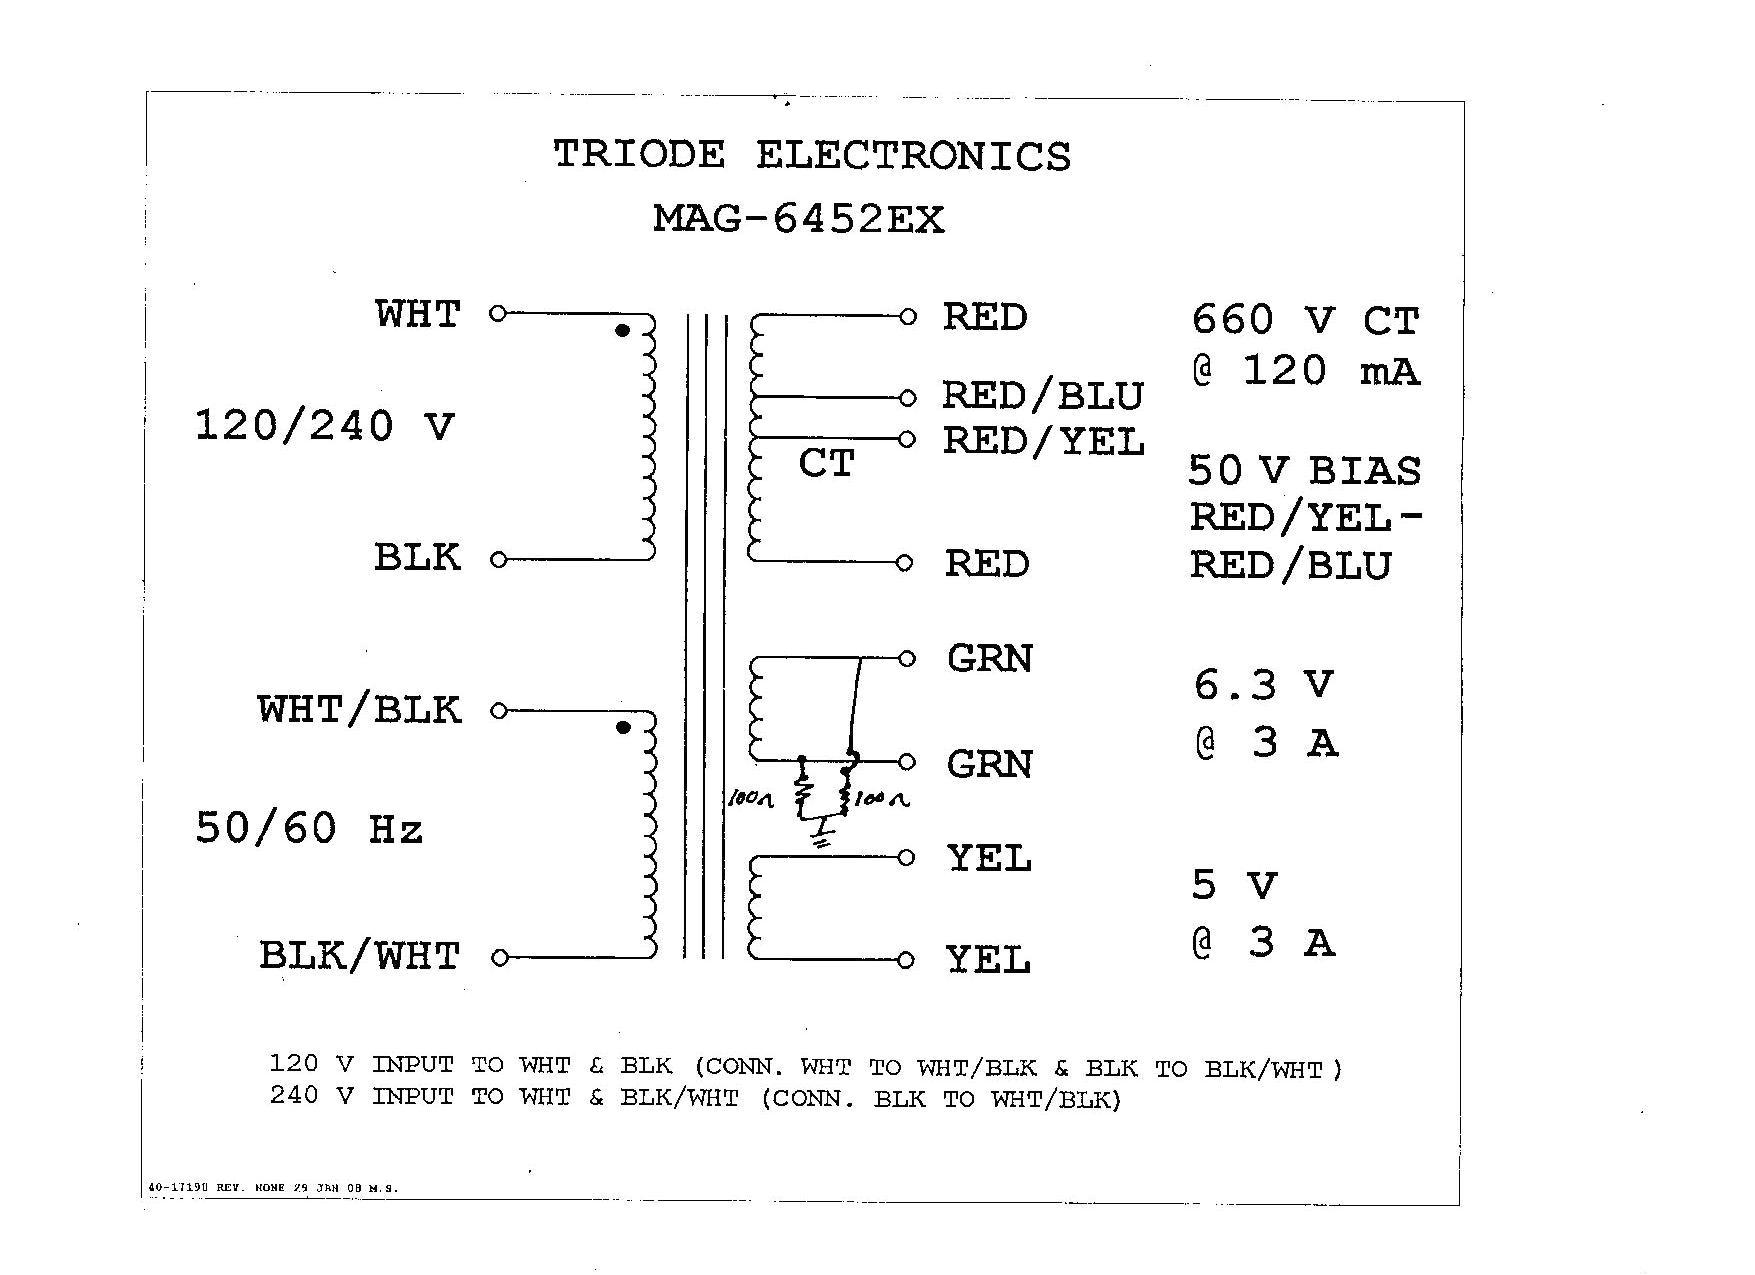 480v to 120v transformer wiring diagram wiring control power transformer for motor circuits eep of 480v to 120v transformer wiring diagram jpg